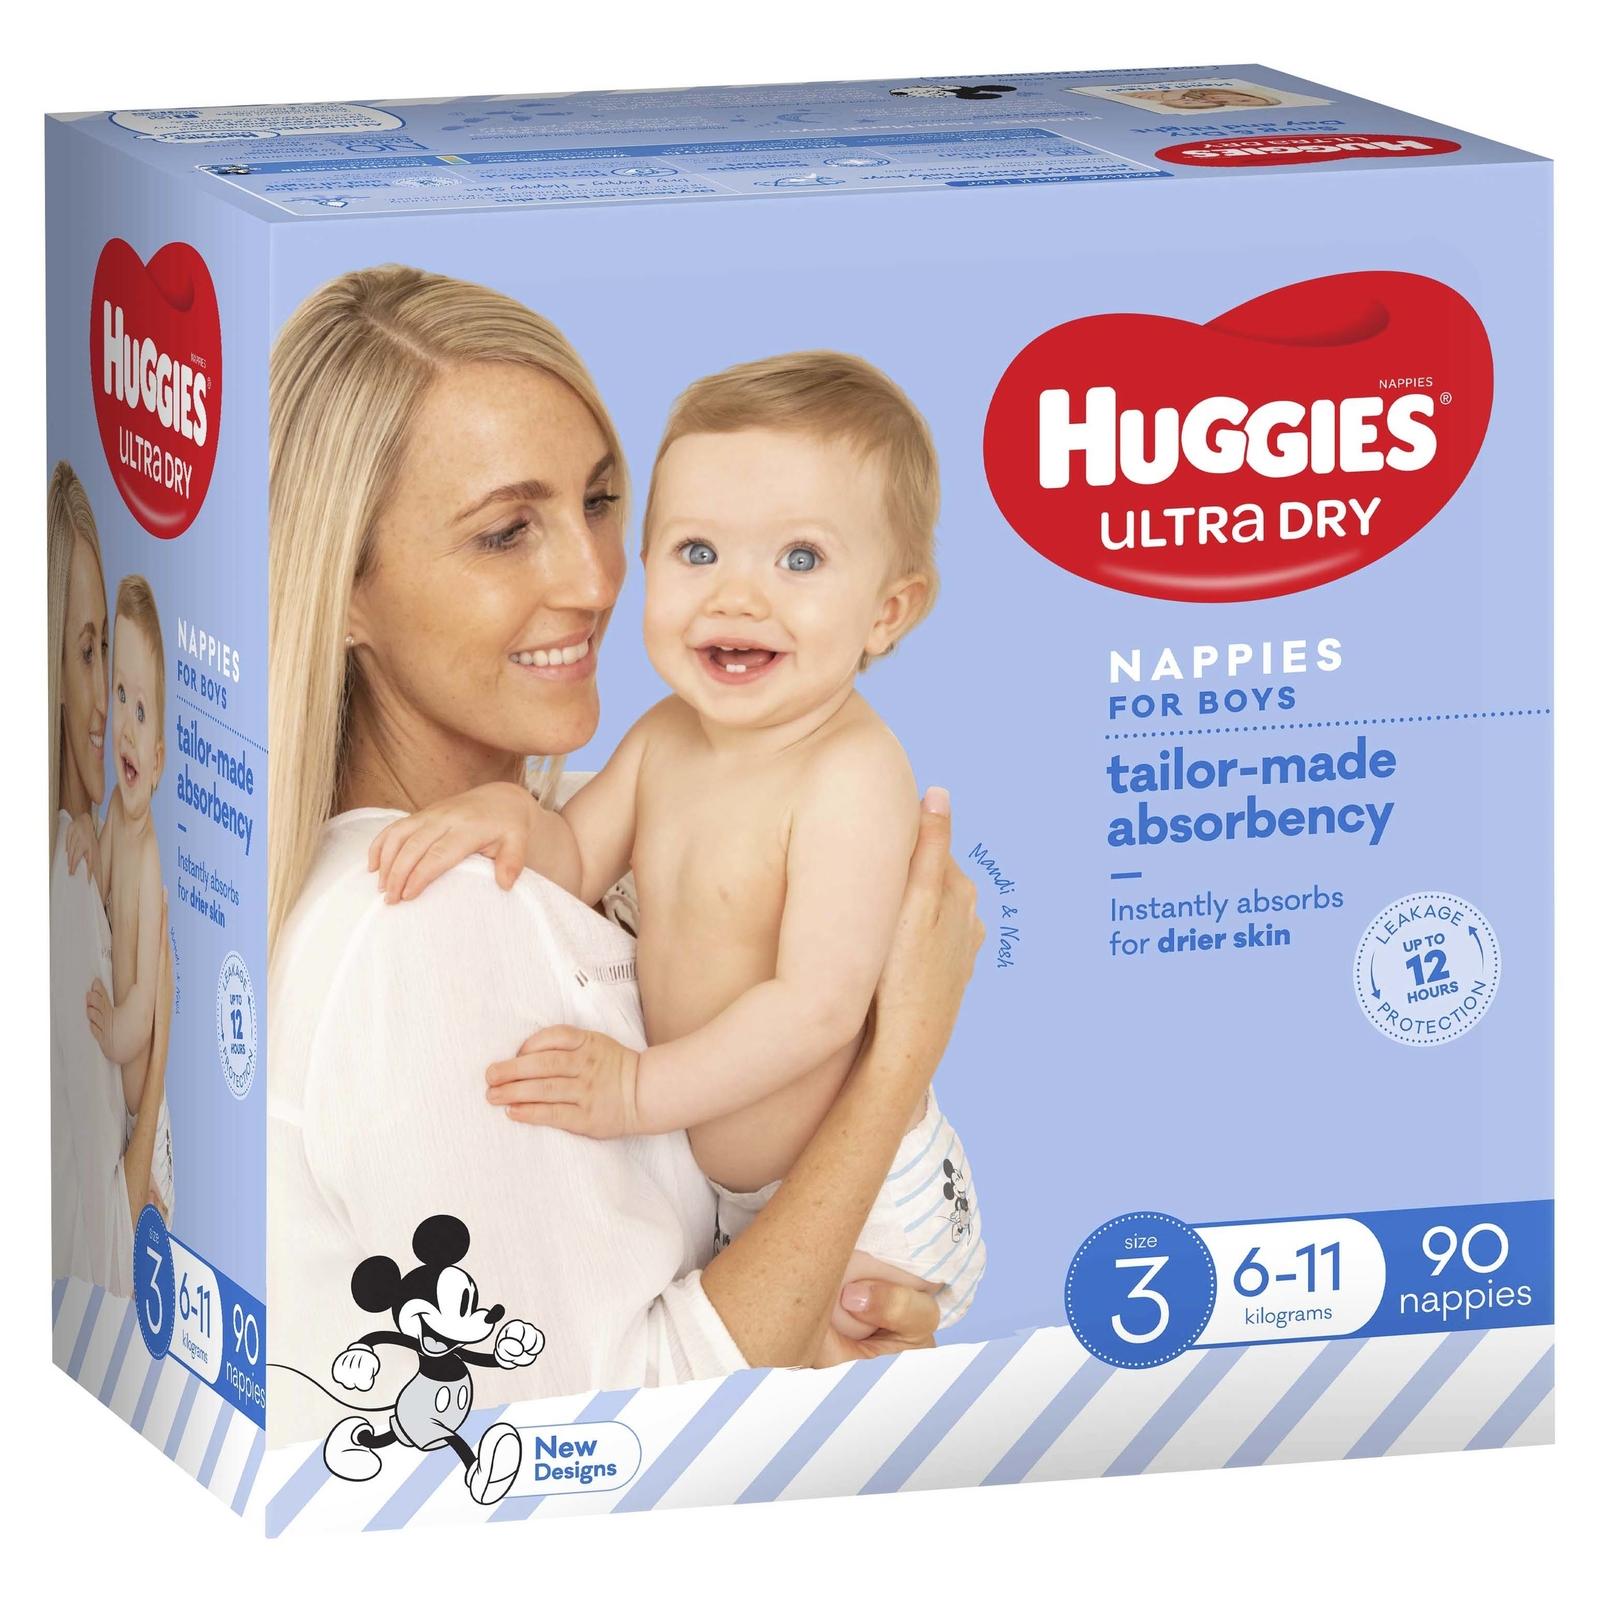 Huggies Ultra Dry Nappies Jumbo Pack - Size 3 Crawler Boy (90) image